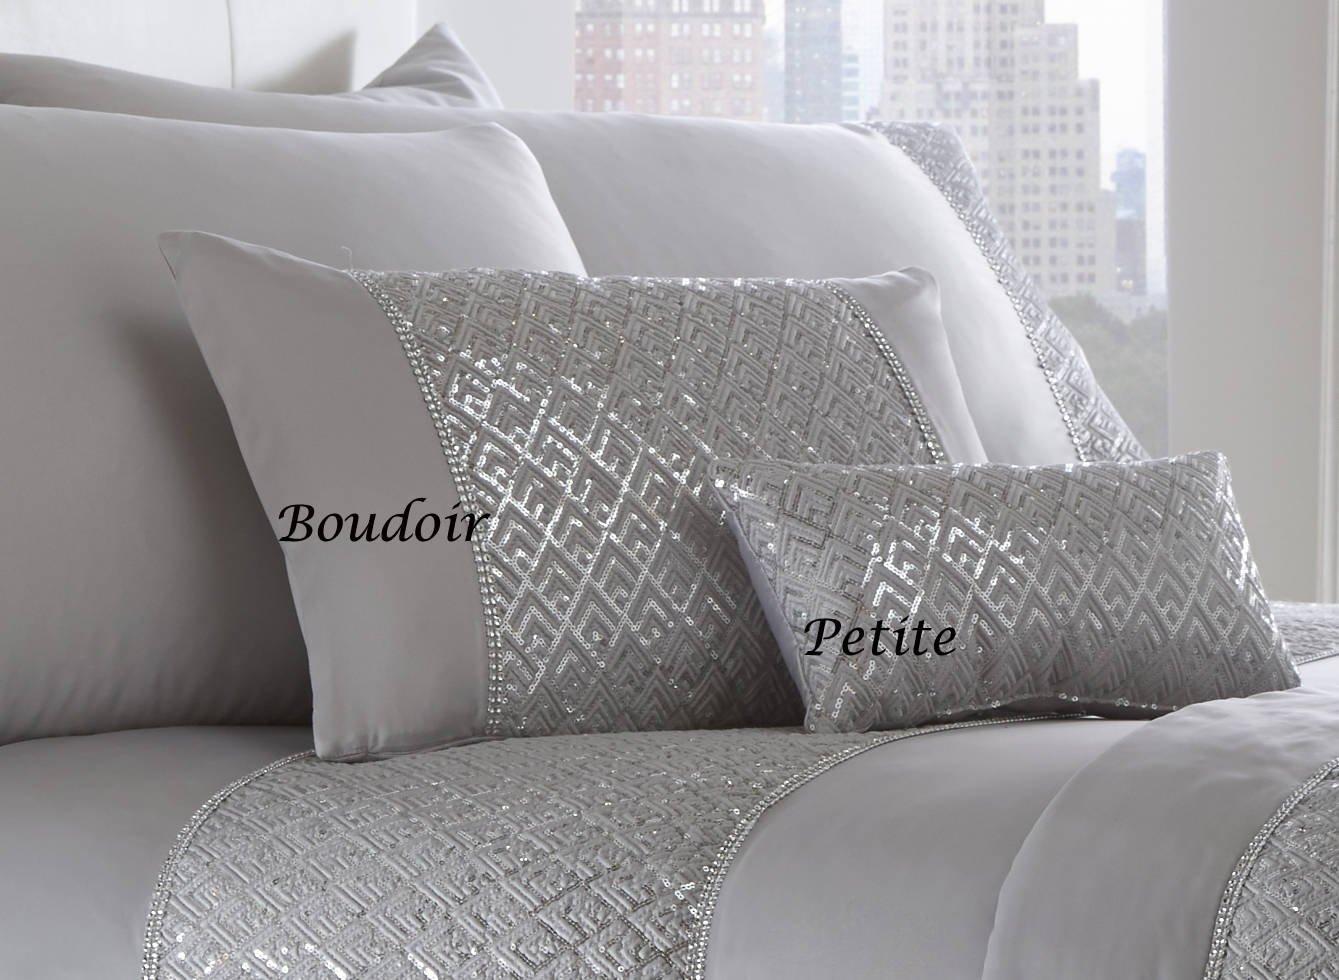 Portfolio Shimmer Luxury Diamante Trim Filled Boudoir Cushion Sham 32cm x 50cm Silver